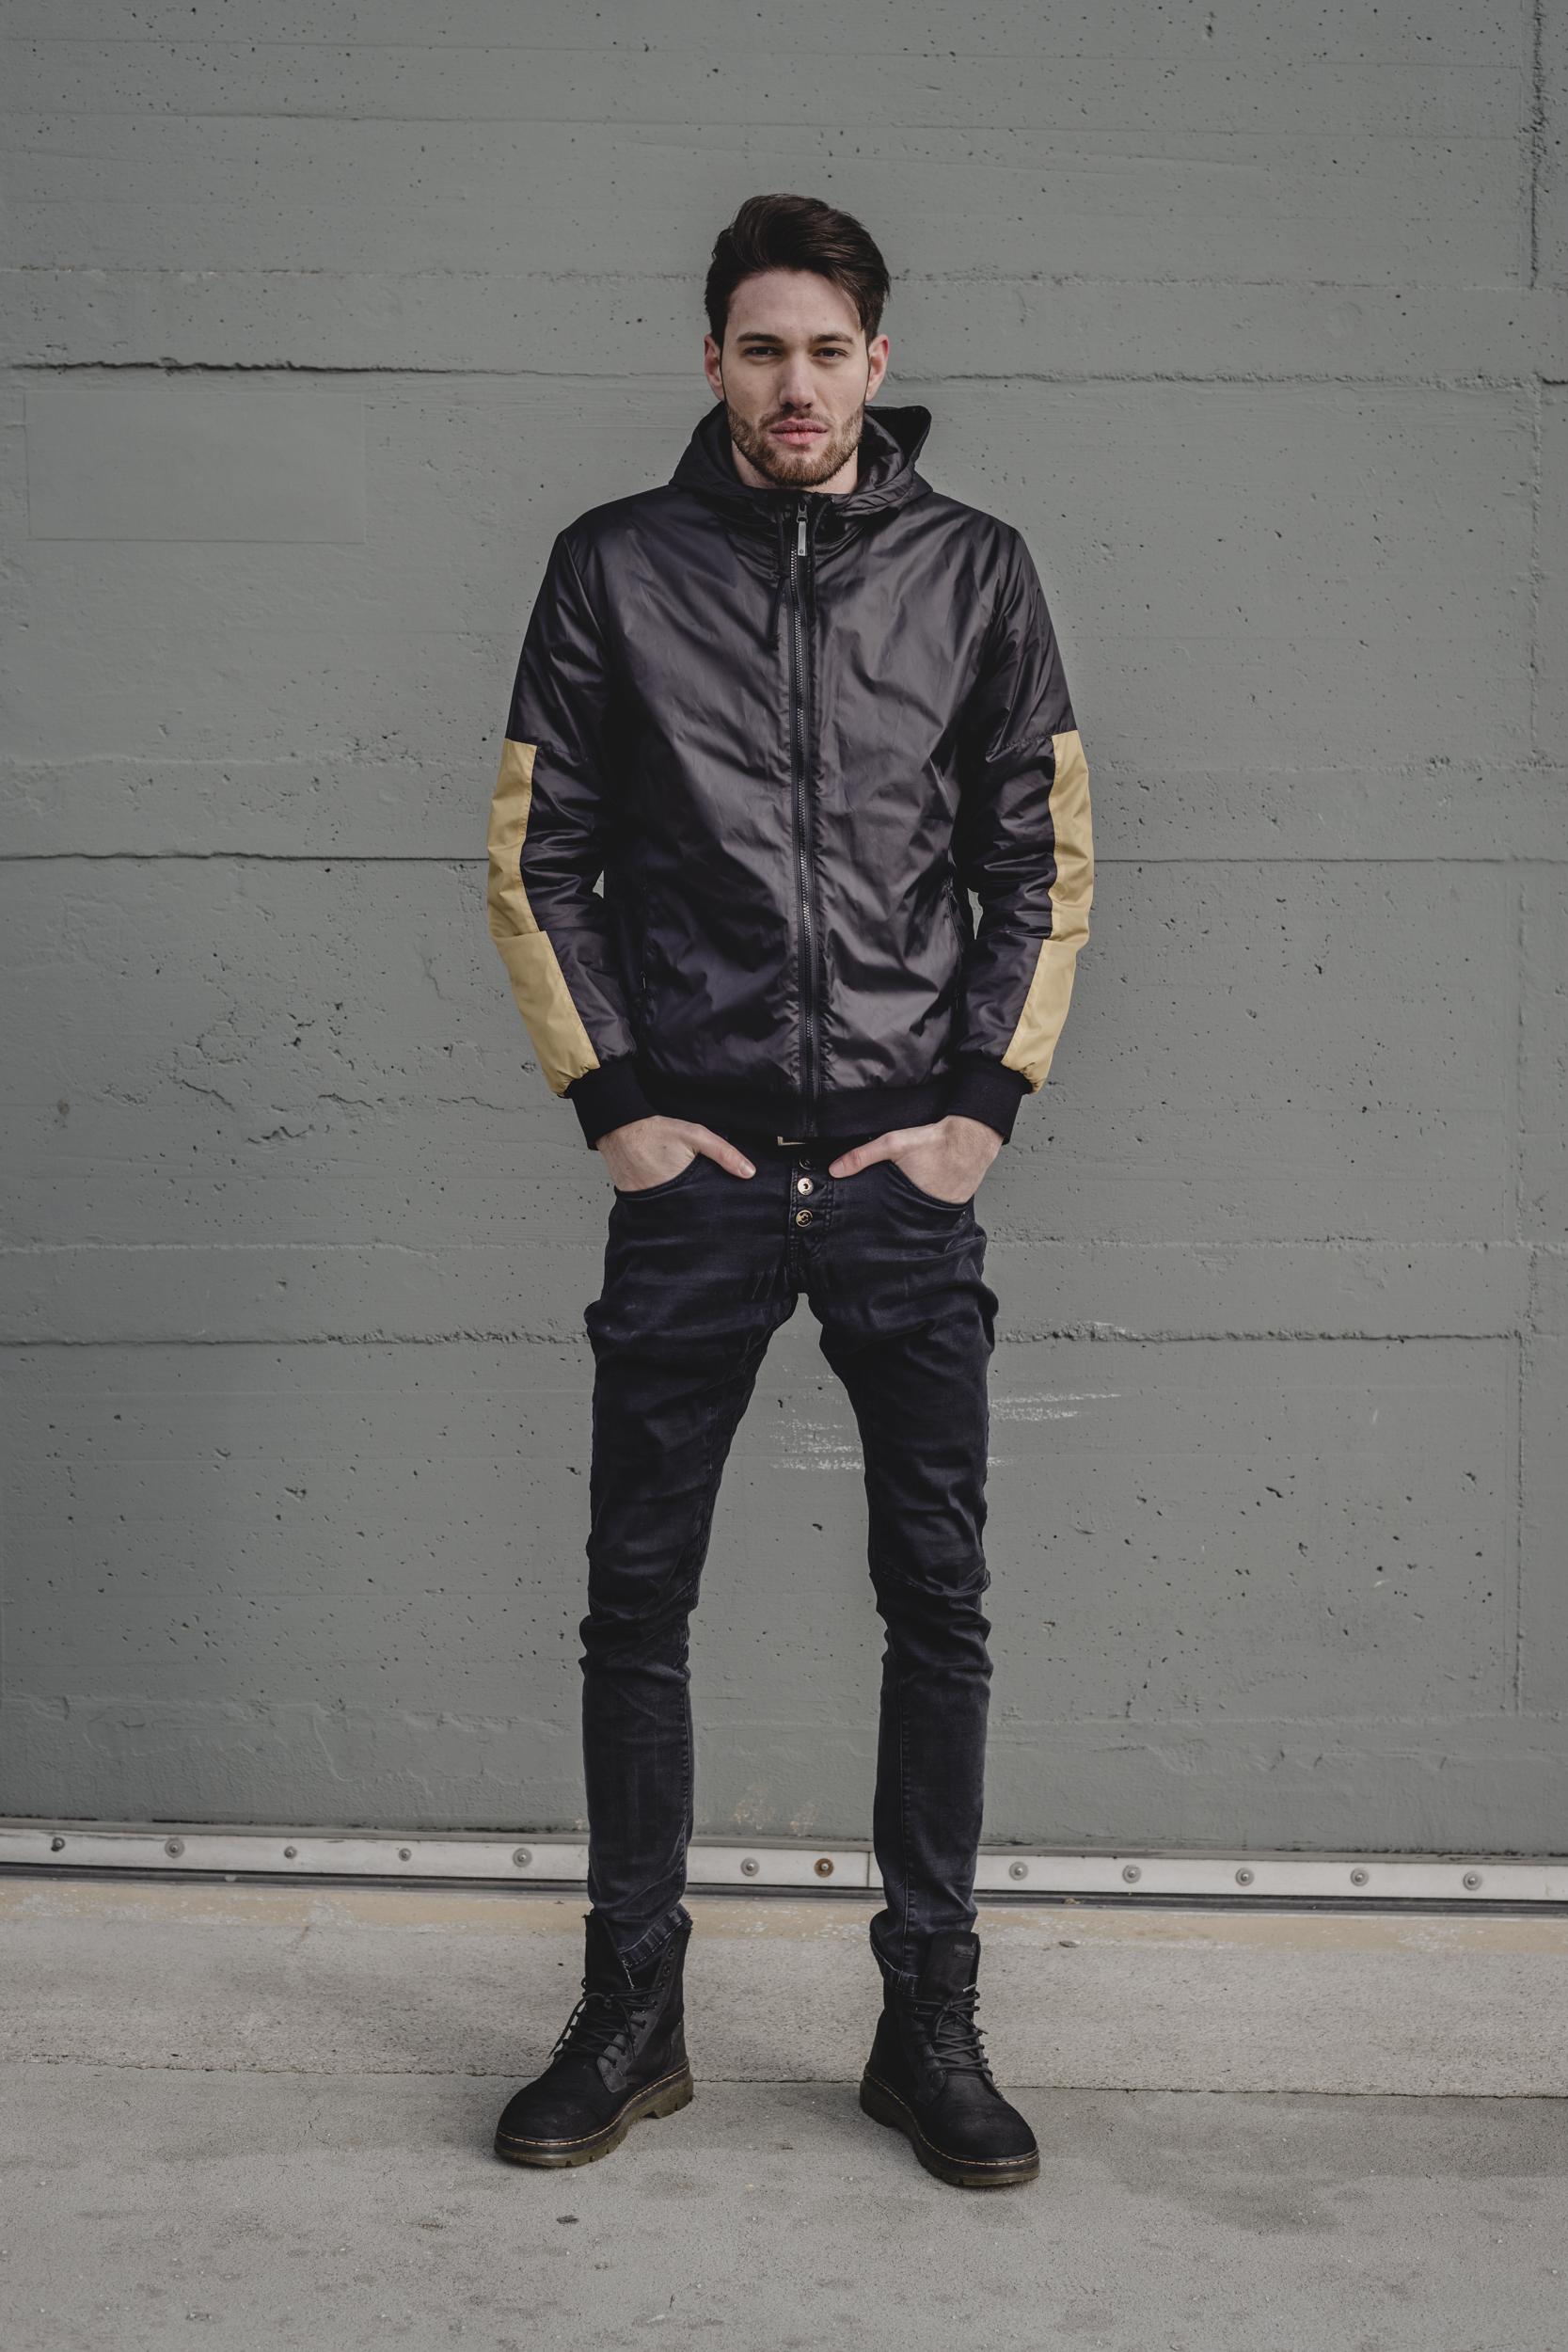 TT_fw2018_jackets_gsx5970.jpg